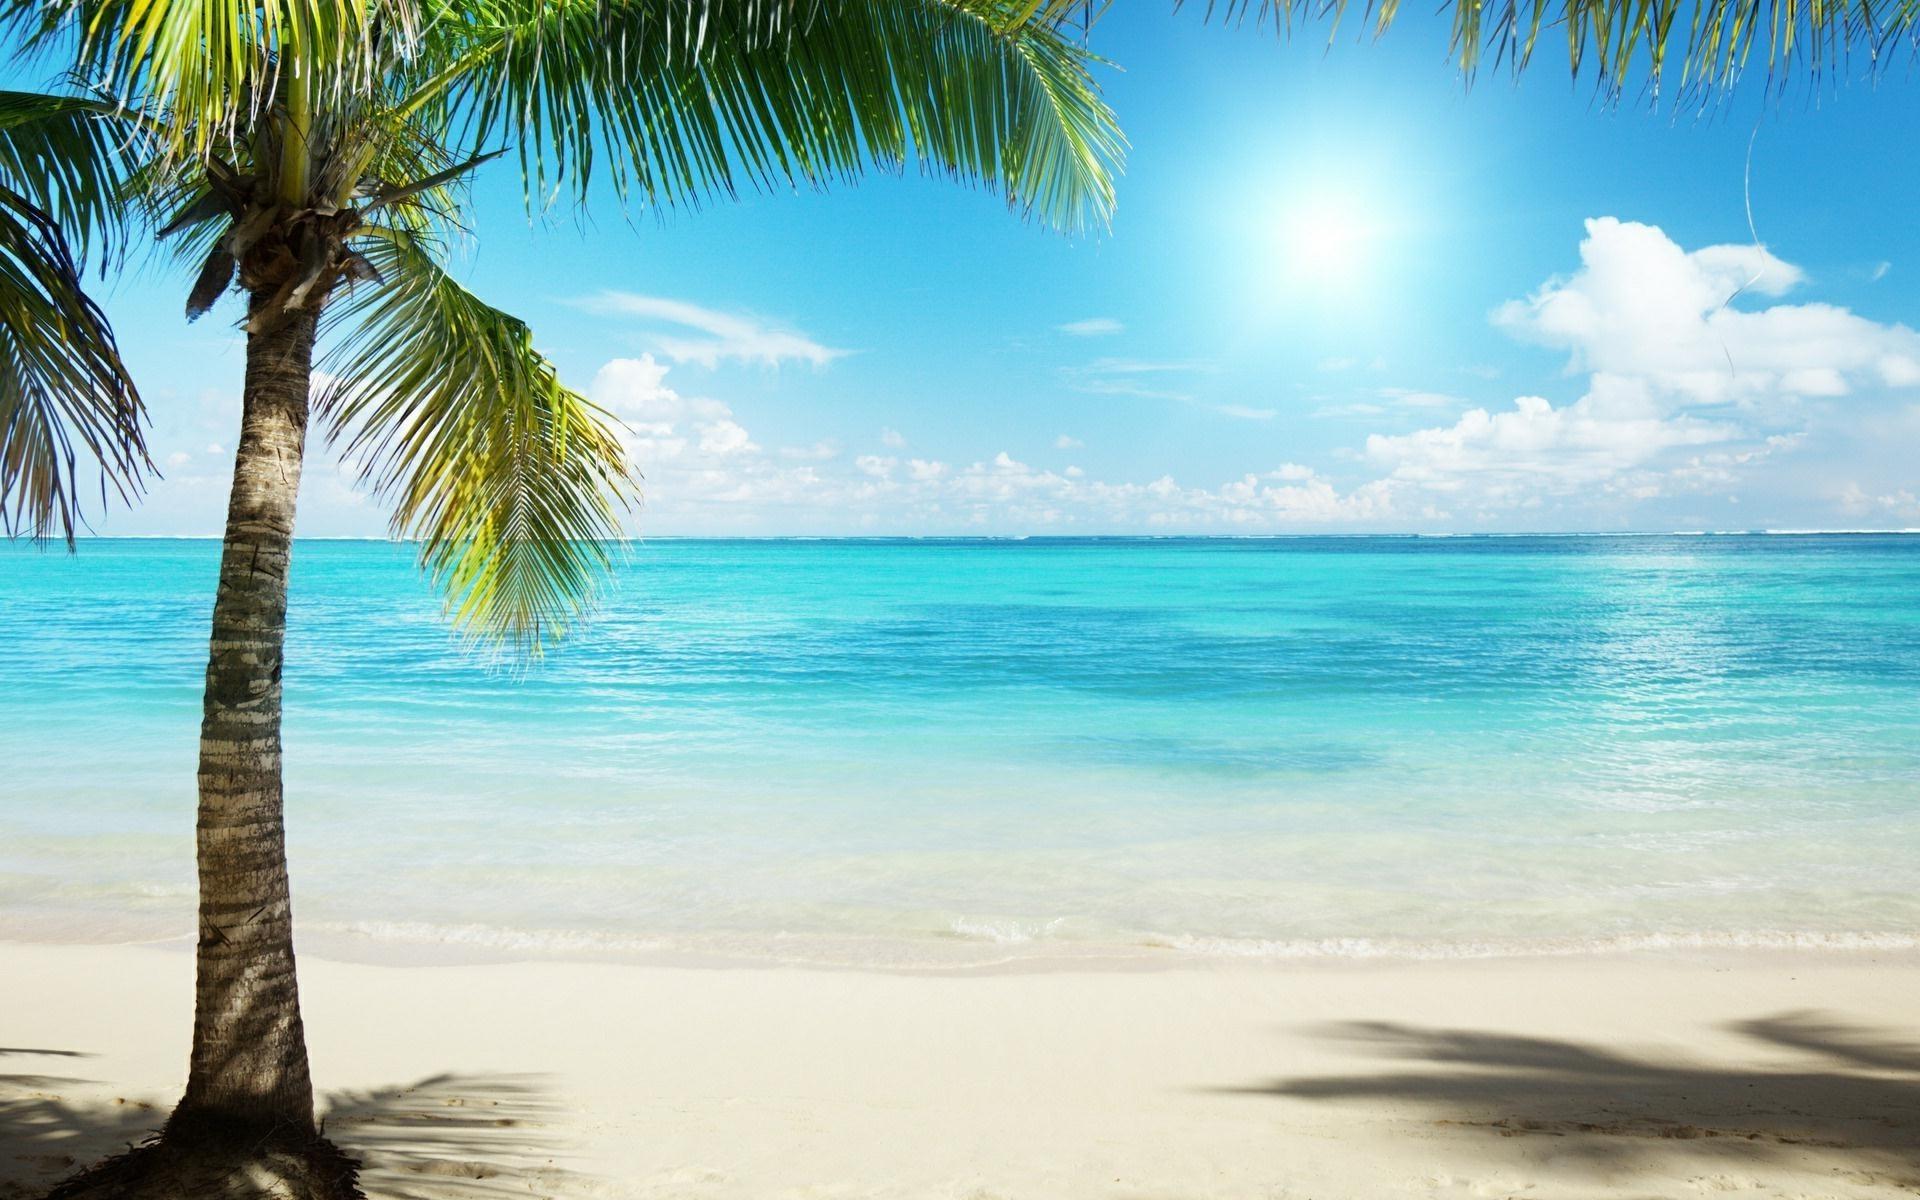 Tropical Beach Background wallpaper     #6783